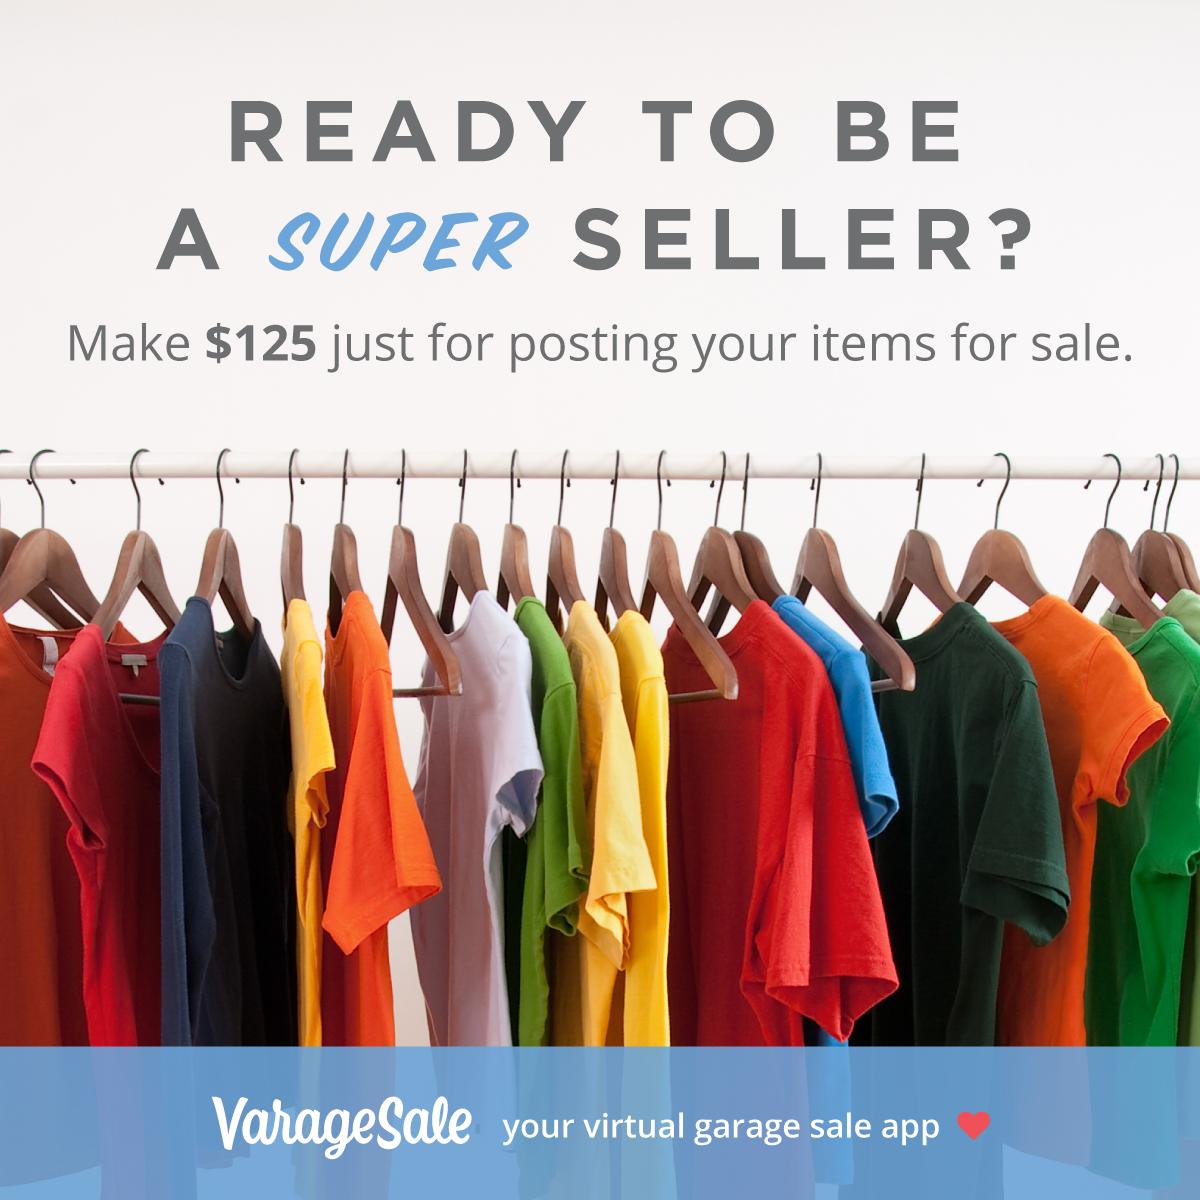 Varagesale Online Garage Sale Communities Online Garage Sale Sell Your Stuff Virtual Garage Sale